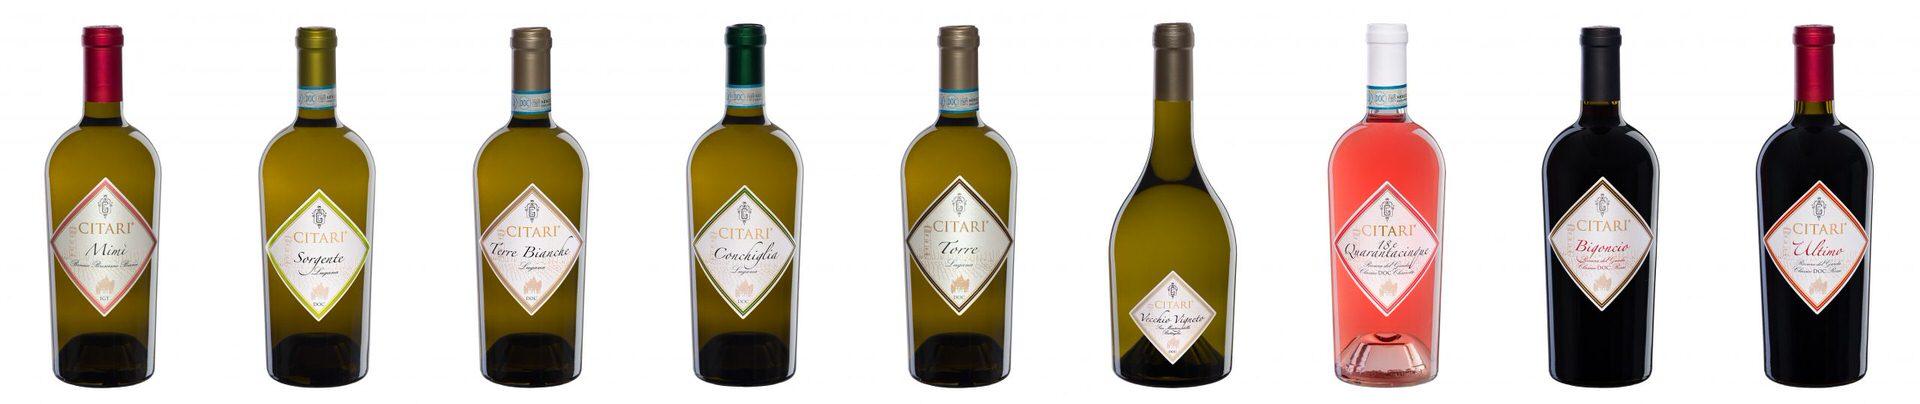 photoring-catalogo stil life cantina vini